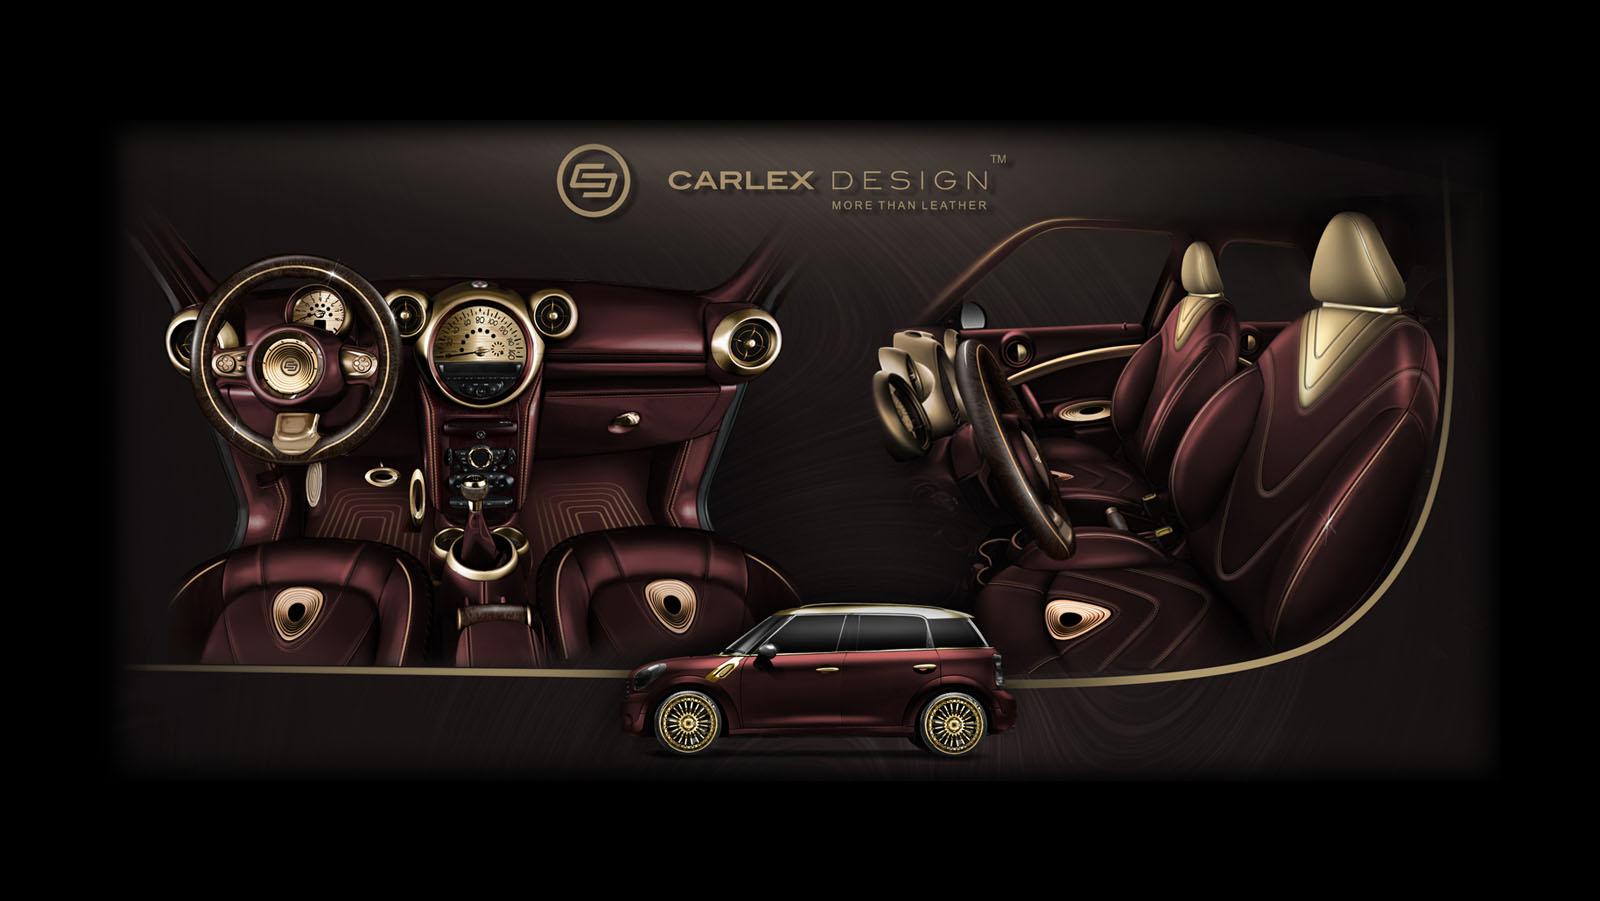 Carlex Design Previews New Mini Countryman Project